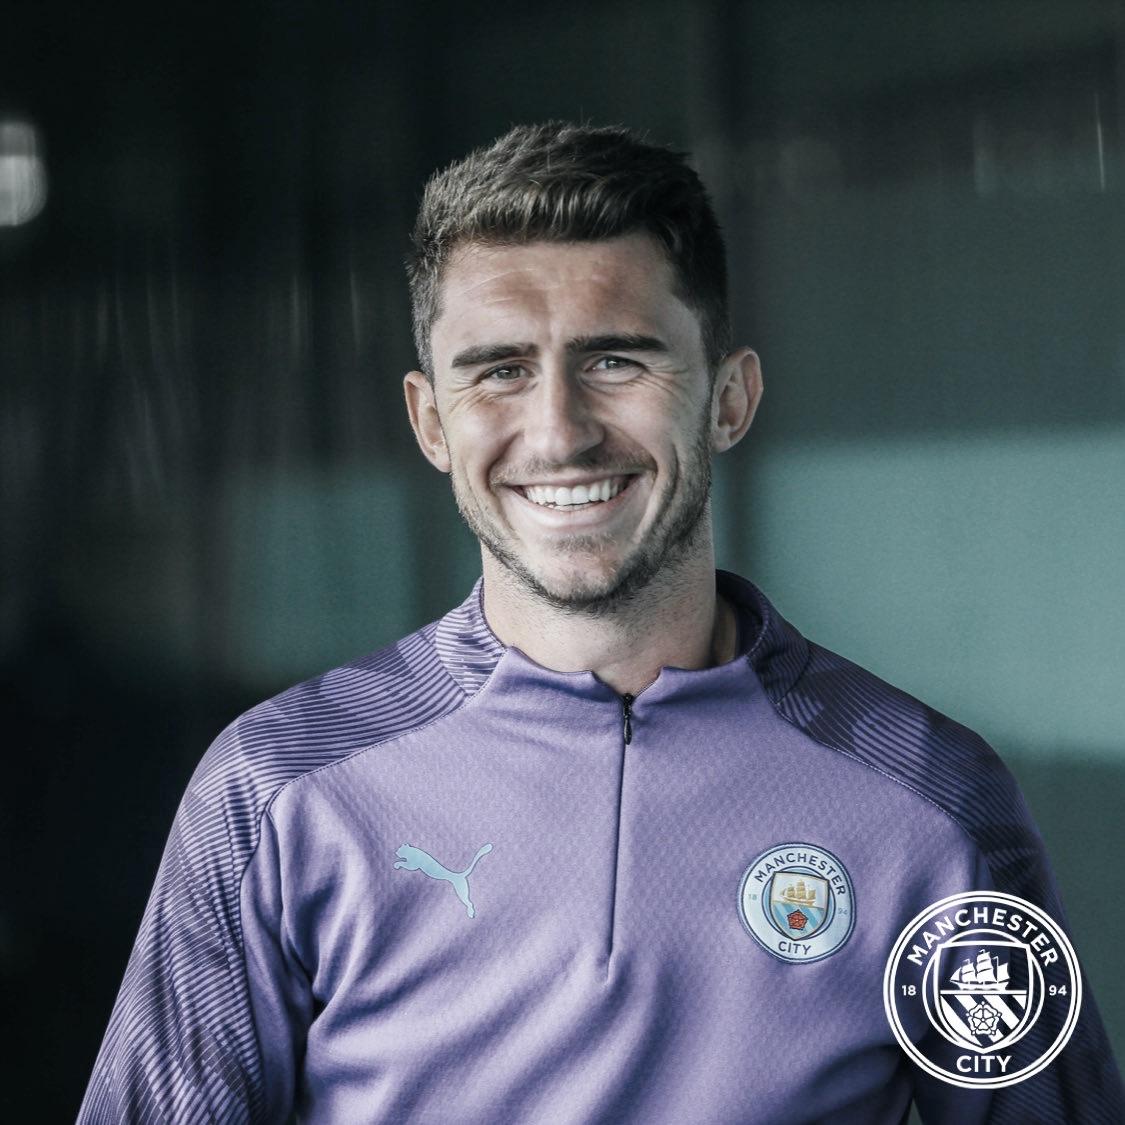 La baja de Laporte descubre un atisbo de incertidumbre en el Manchester City